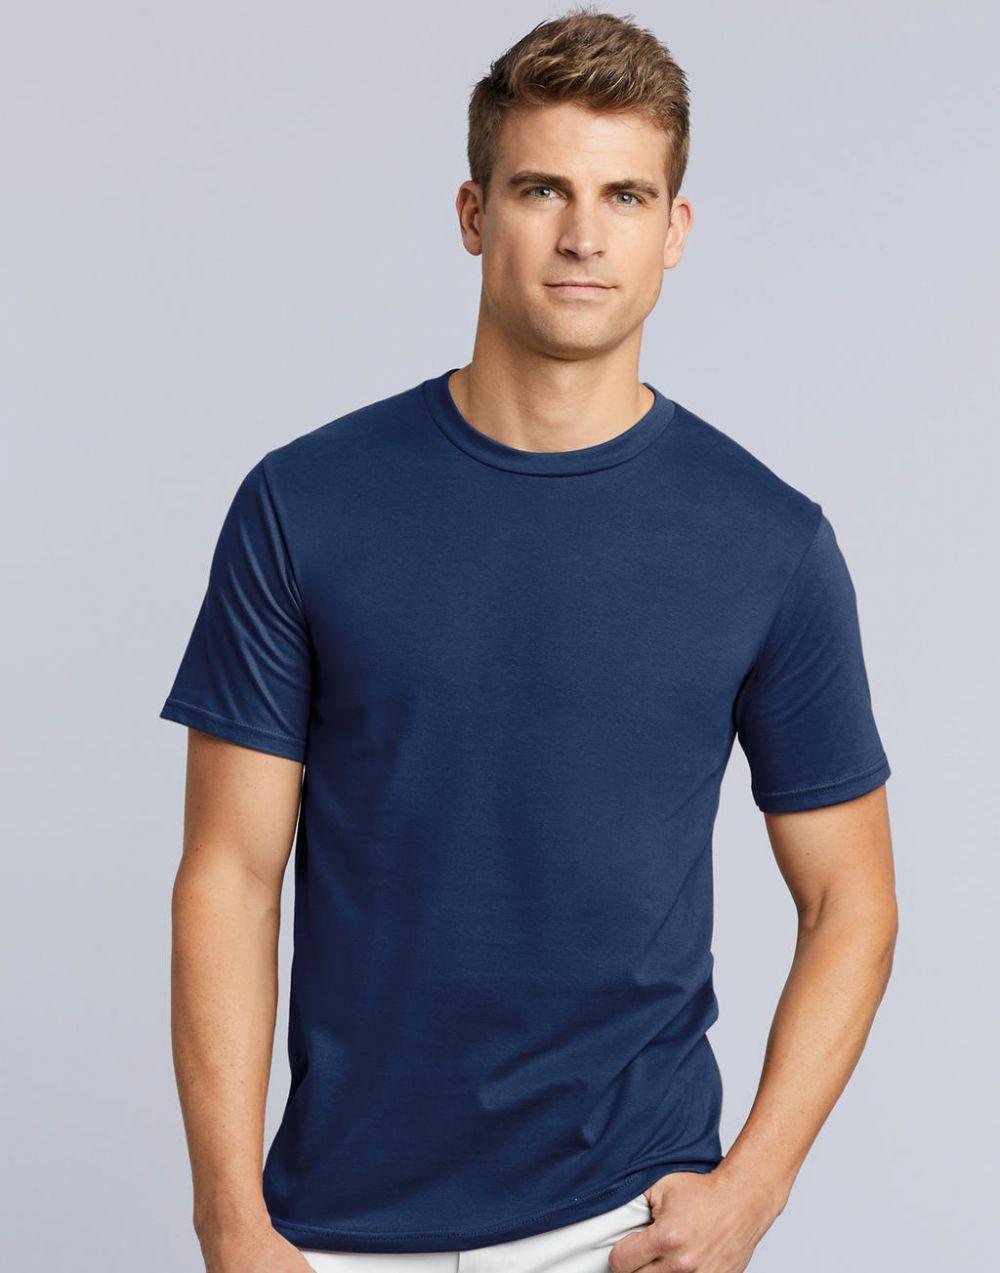 Camisetas manga corta gildan premium 185 gr vista 1